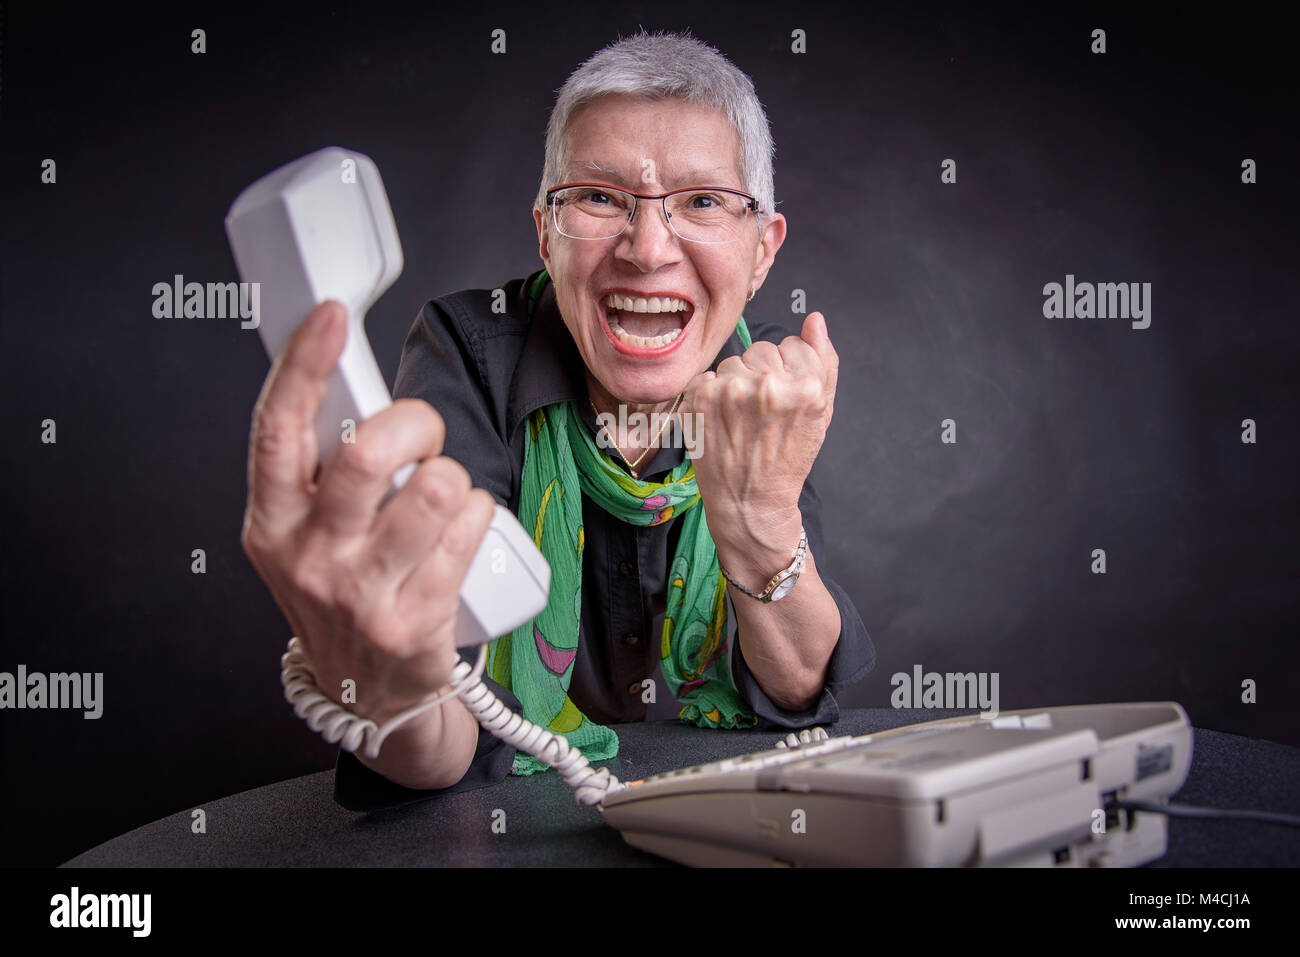 Pésimo servicio, enojado altos mujer gritando al teléfono Foto de stock